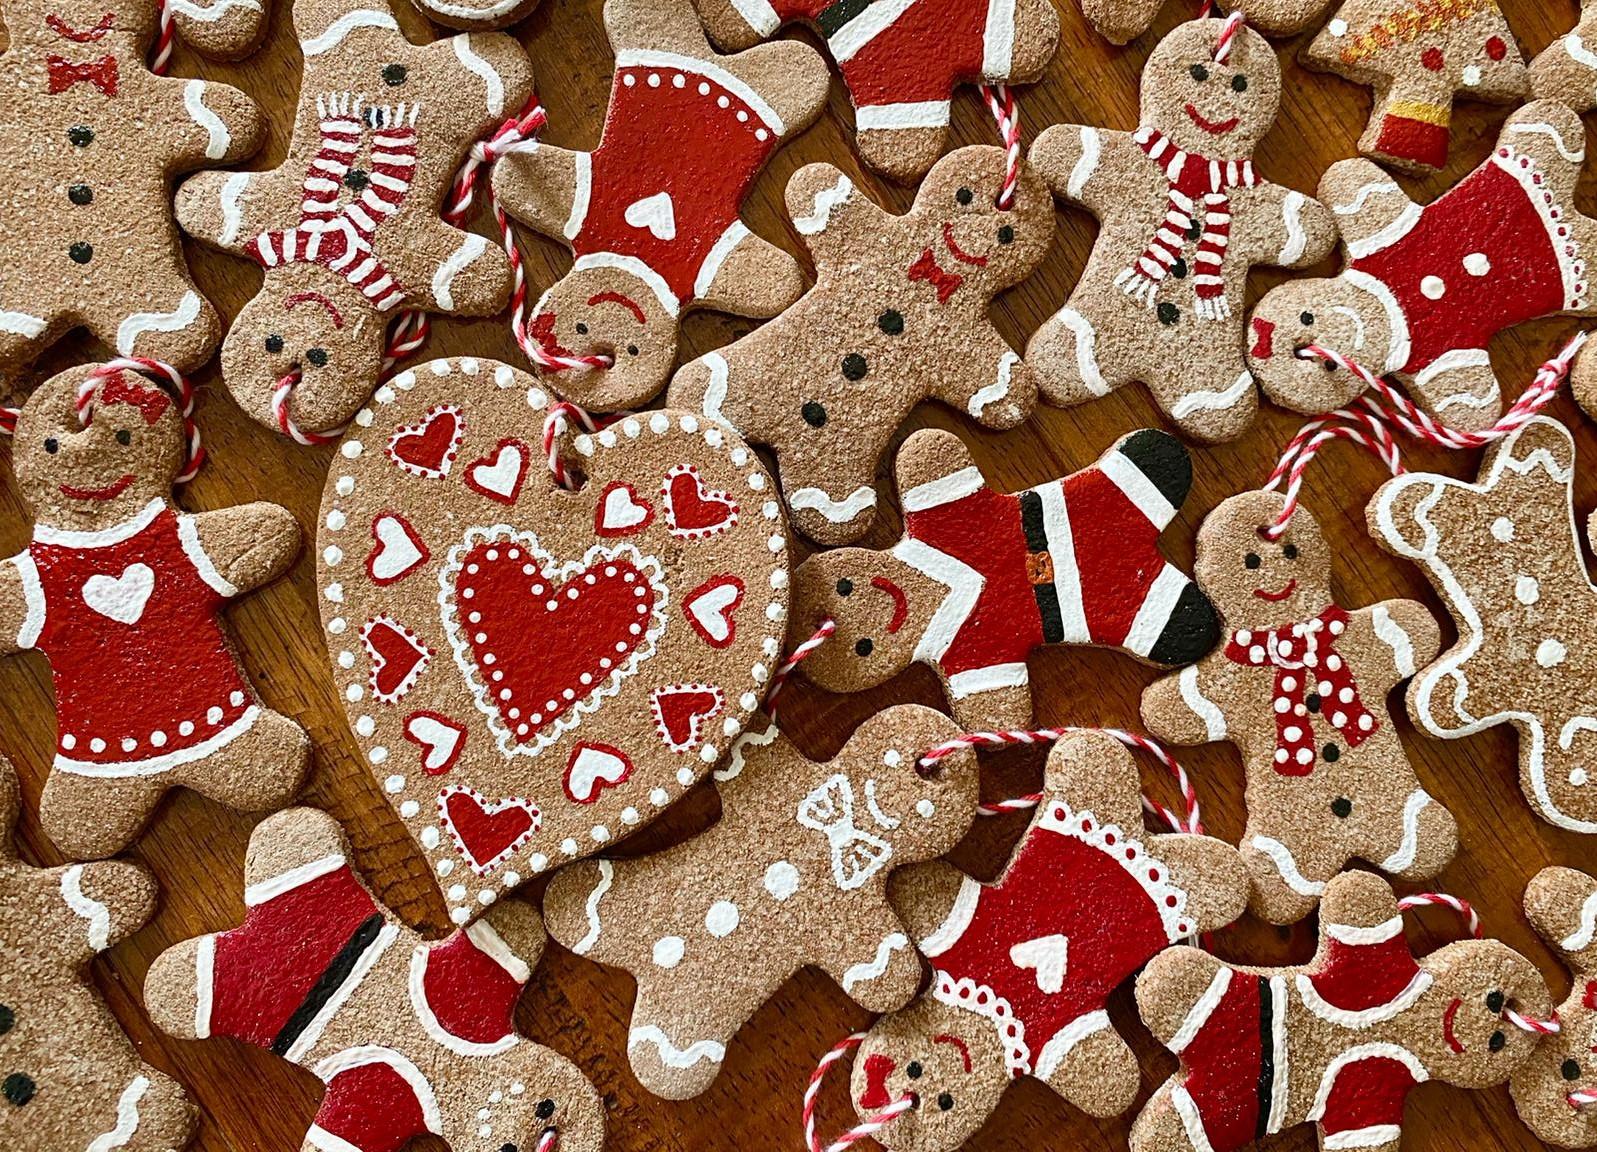 a picture of salt dough gingerbread men